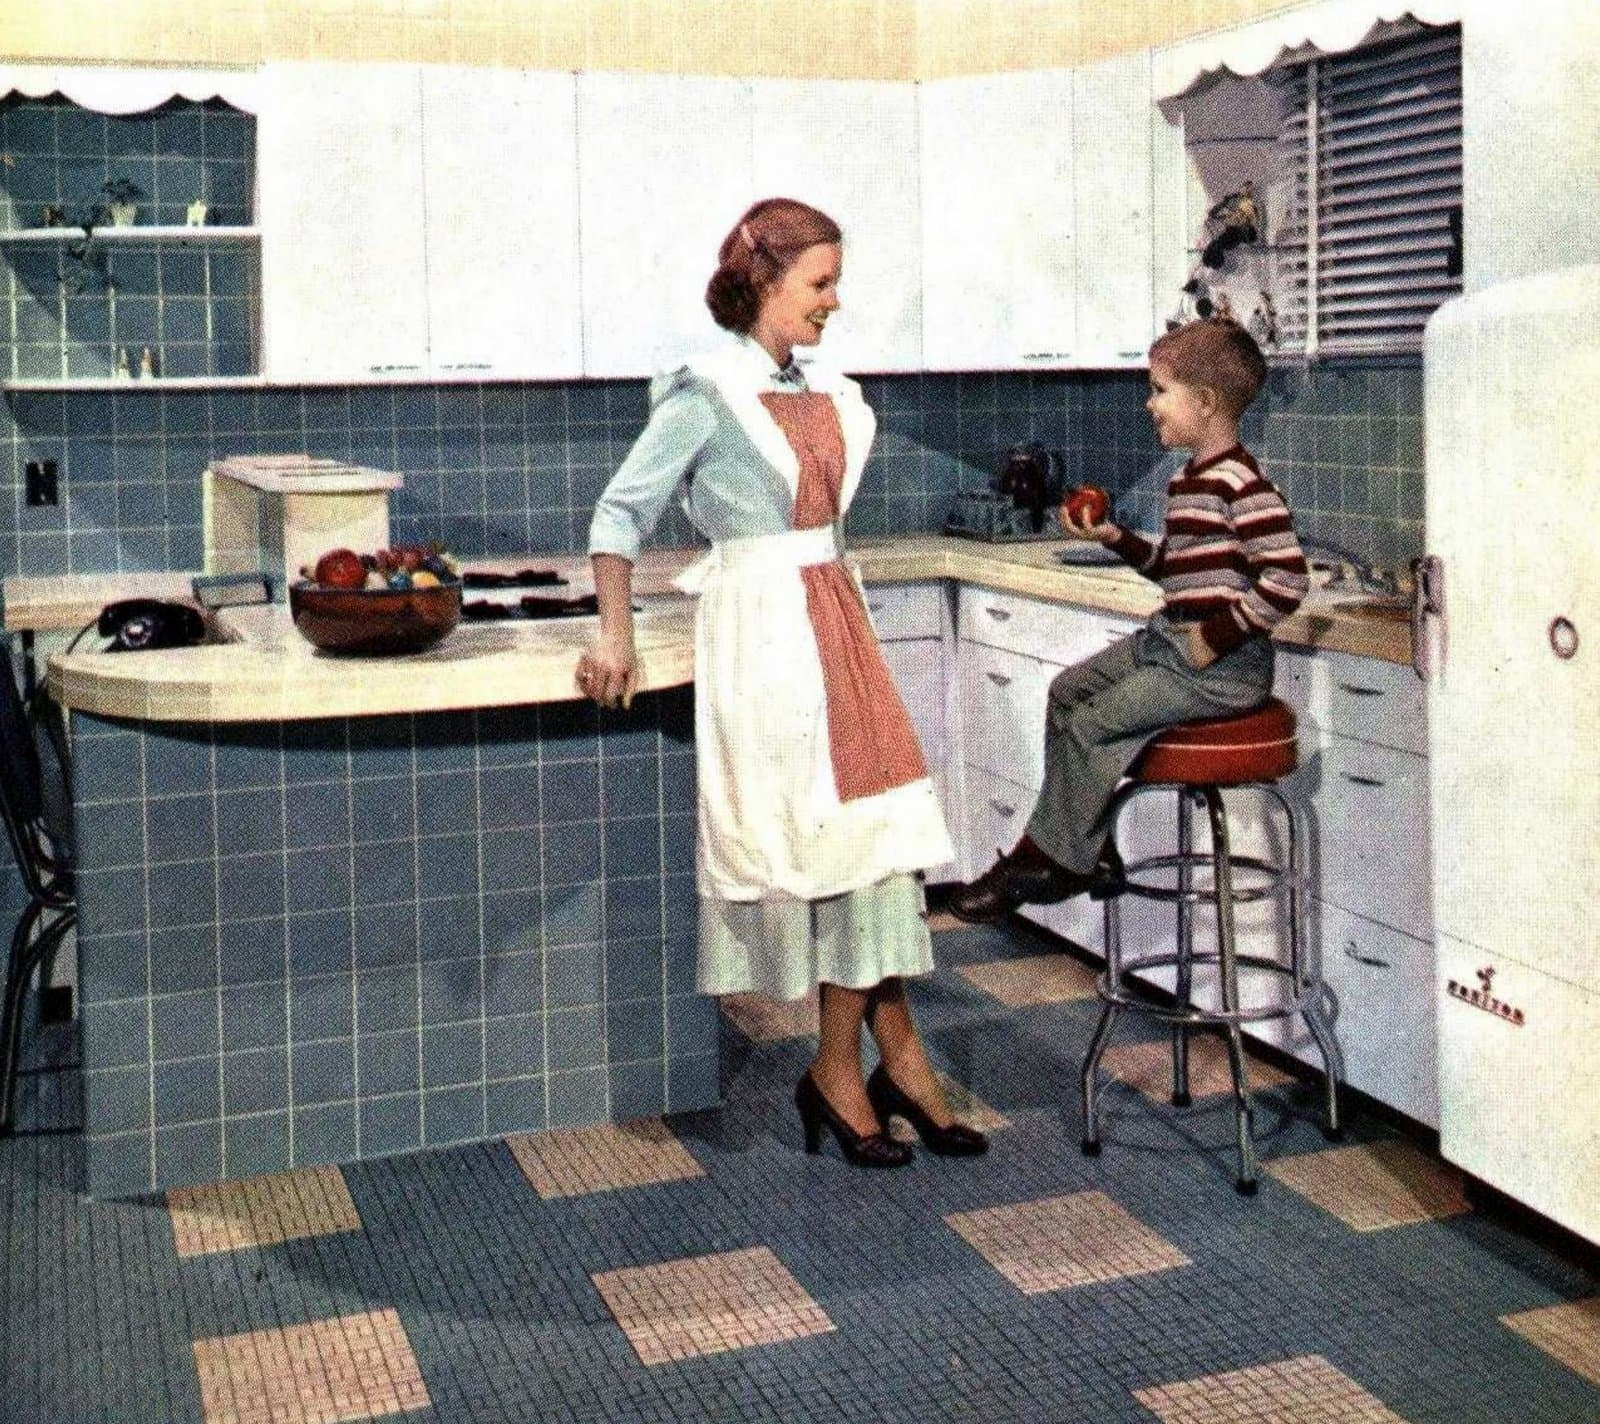 Vintage fifties-style tiled kitchen